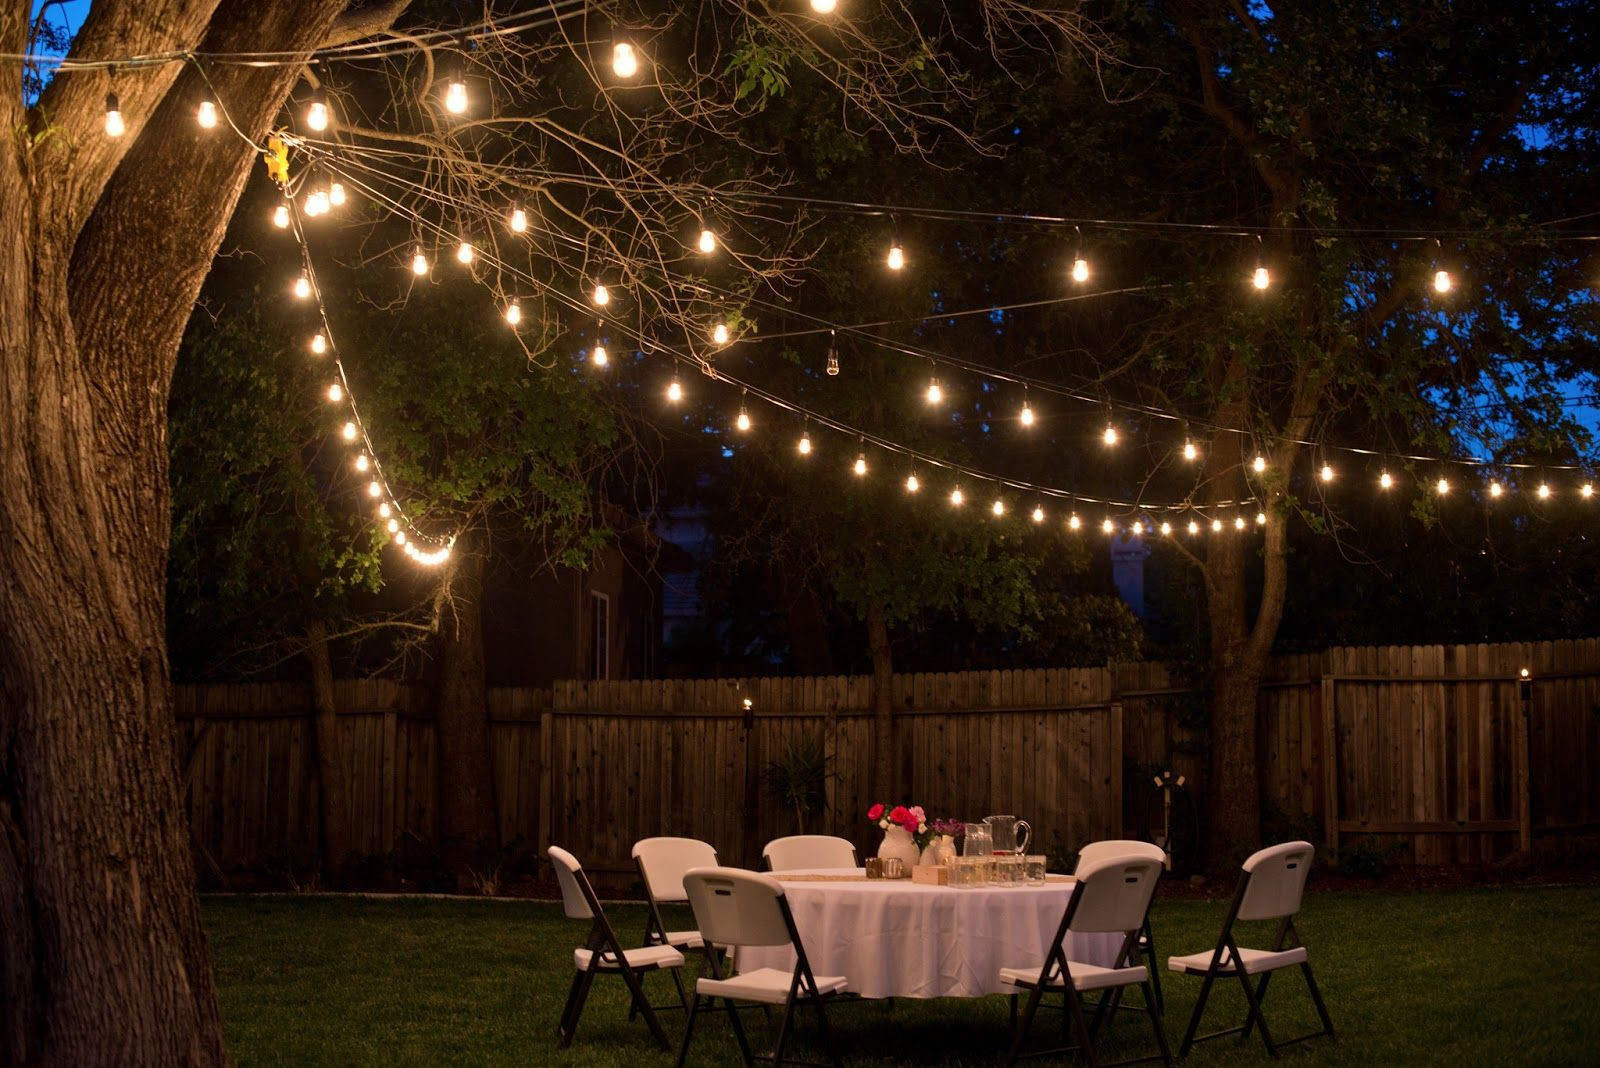 Backyard Party Lighting Ideas  backyard lights Google Search City Scenes